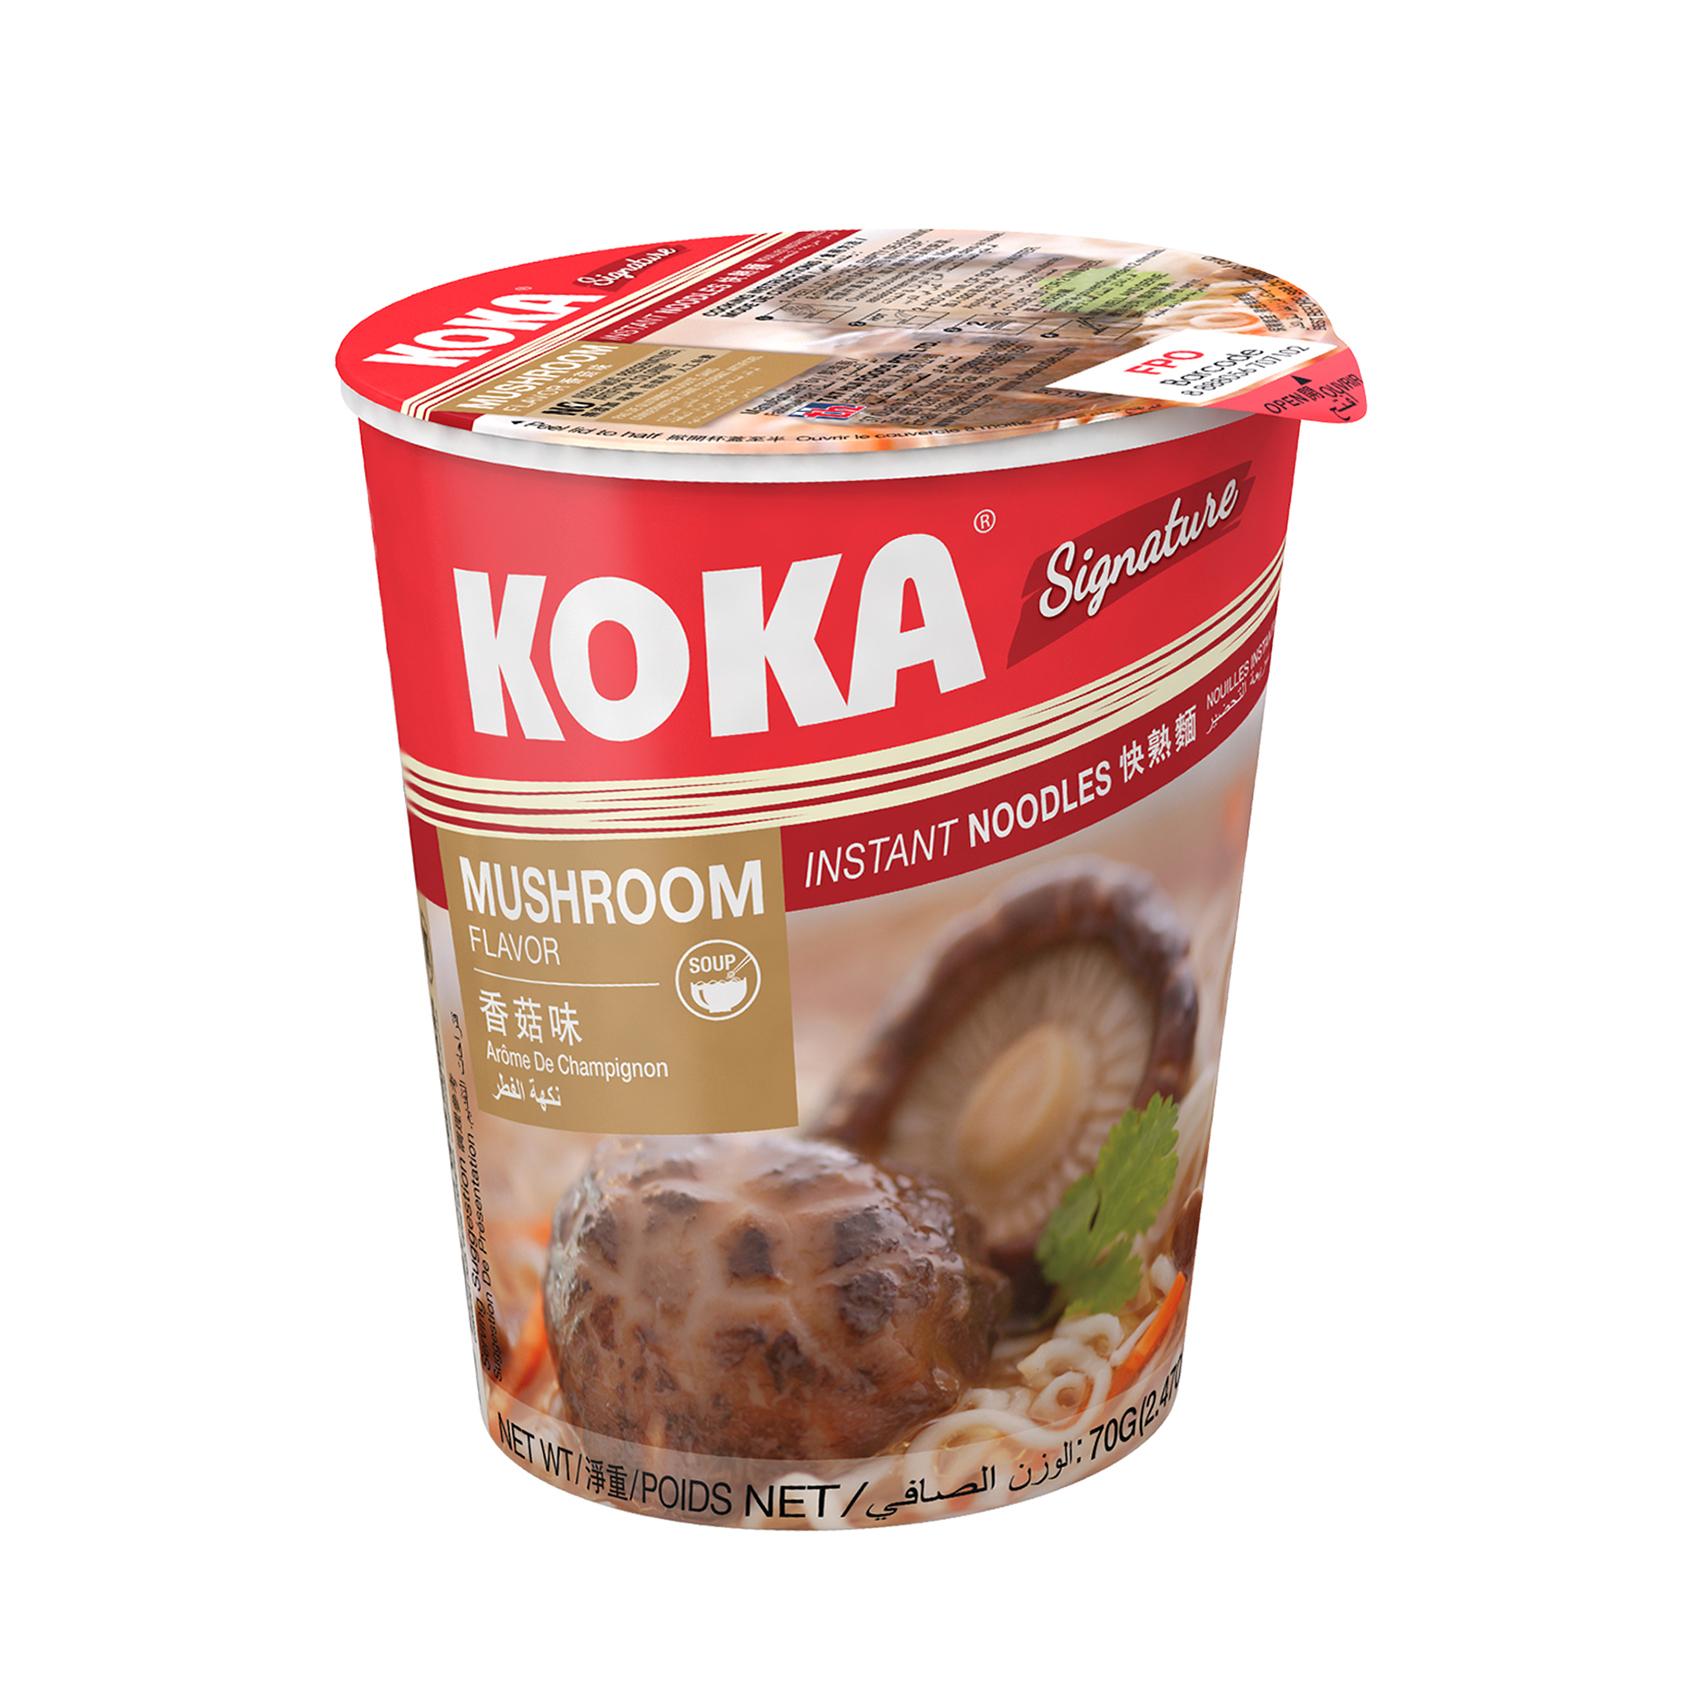 KOKA CUP NOODLES MUSHROOM 70GR